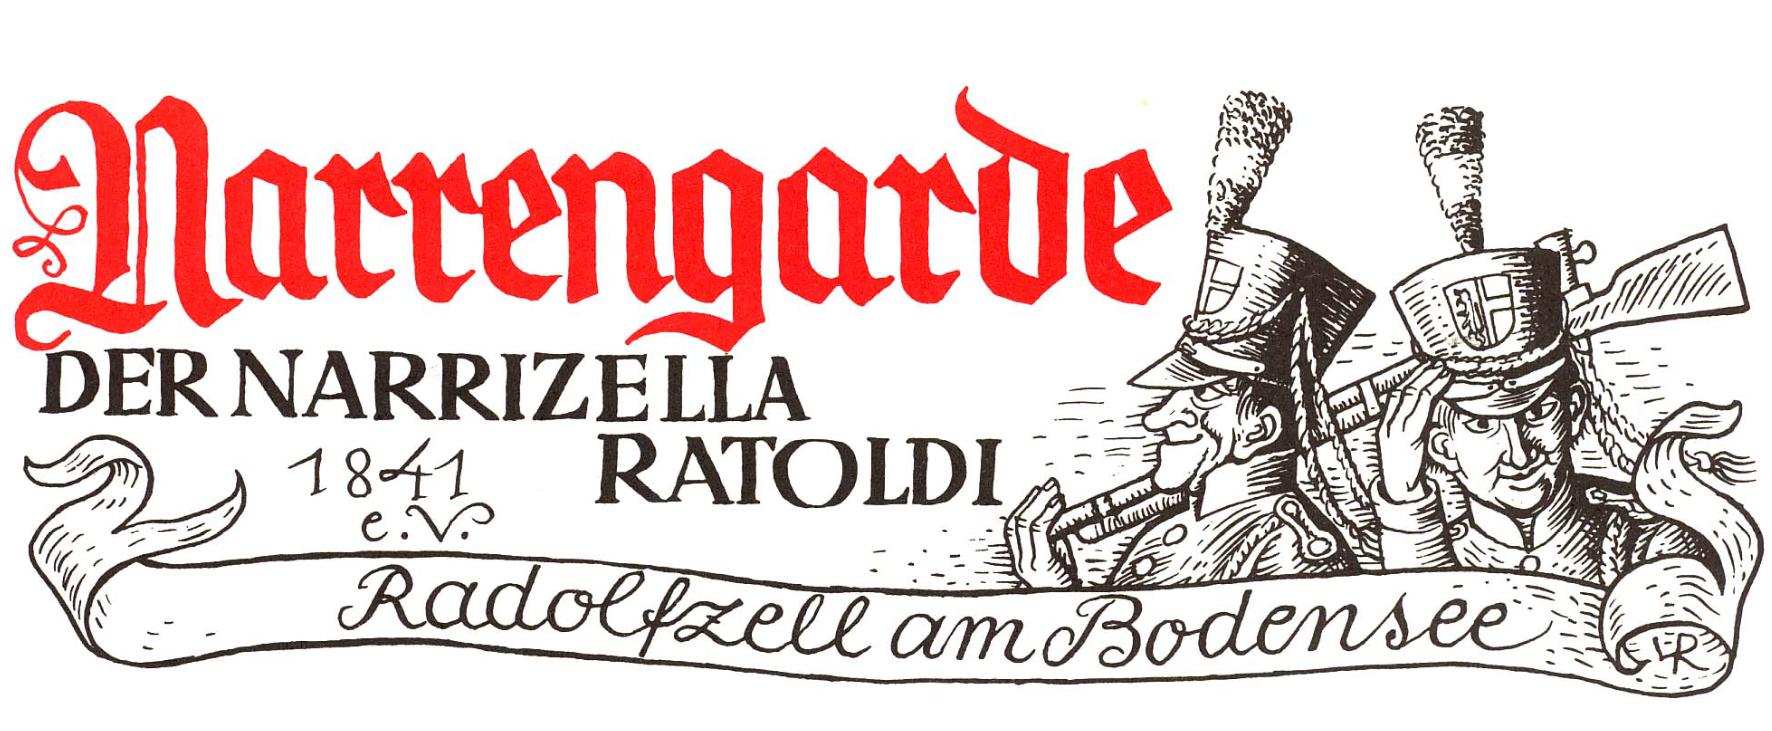 Narrengarde der Narrizella Ratoldi 1841 e.V.